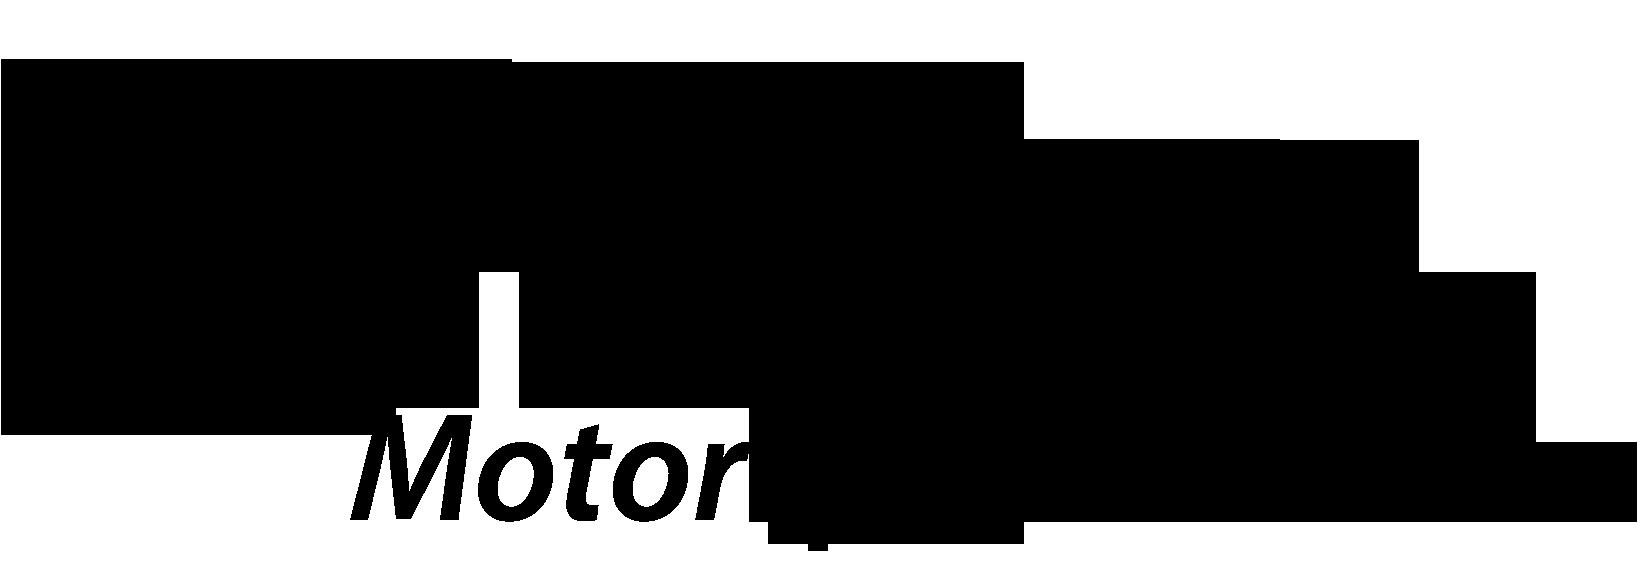 Knöbel Motorsport